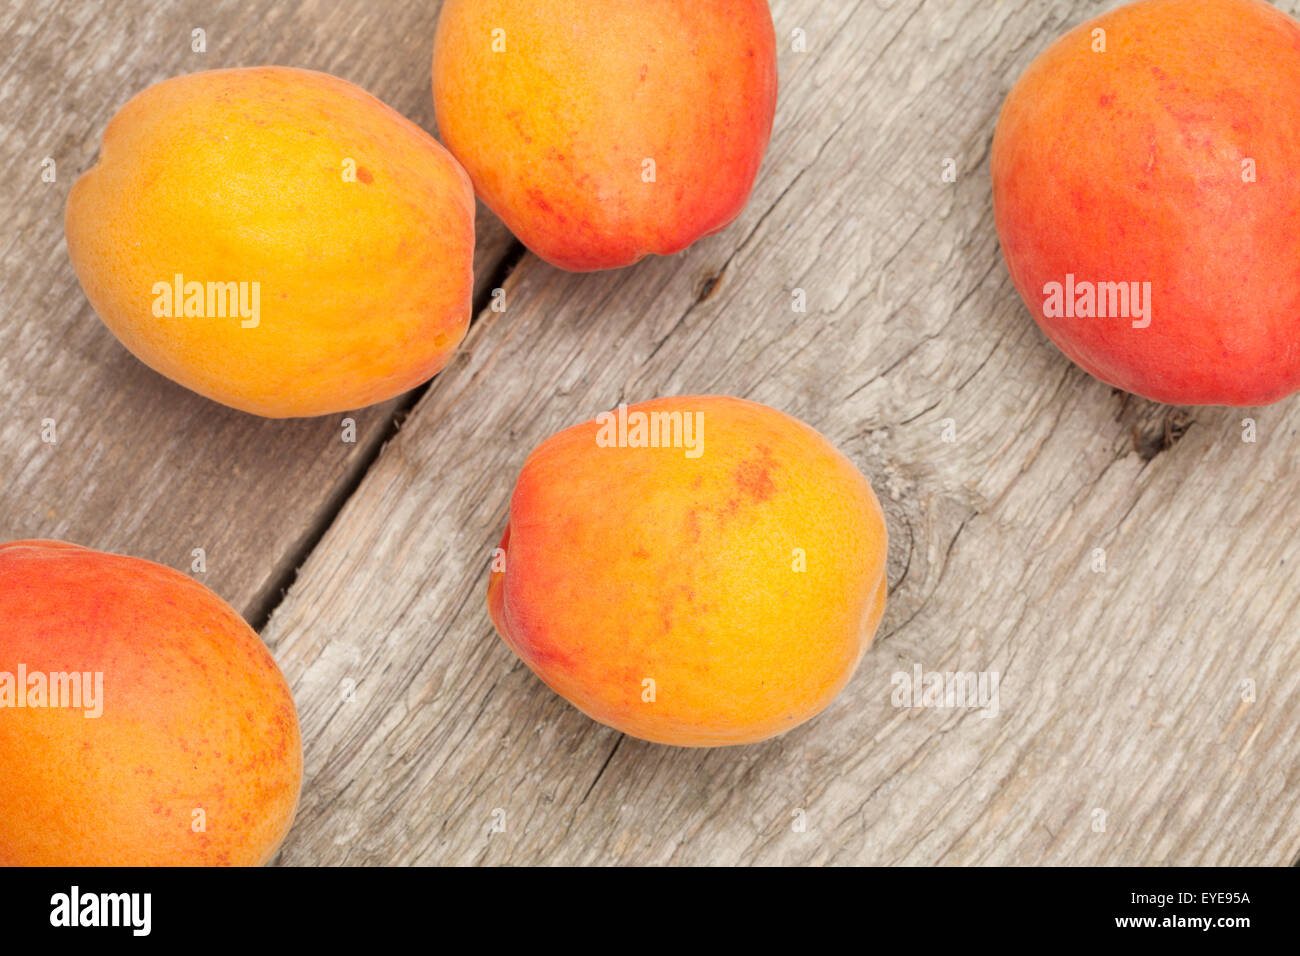 Fresh apricot fruits. - Stock Image